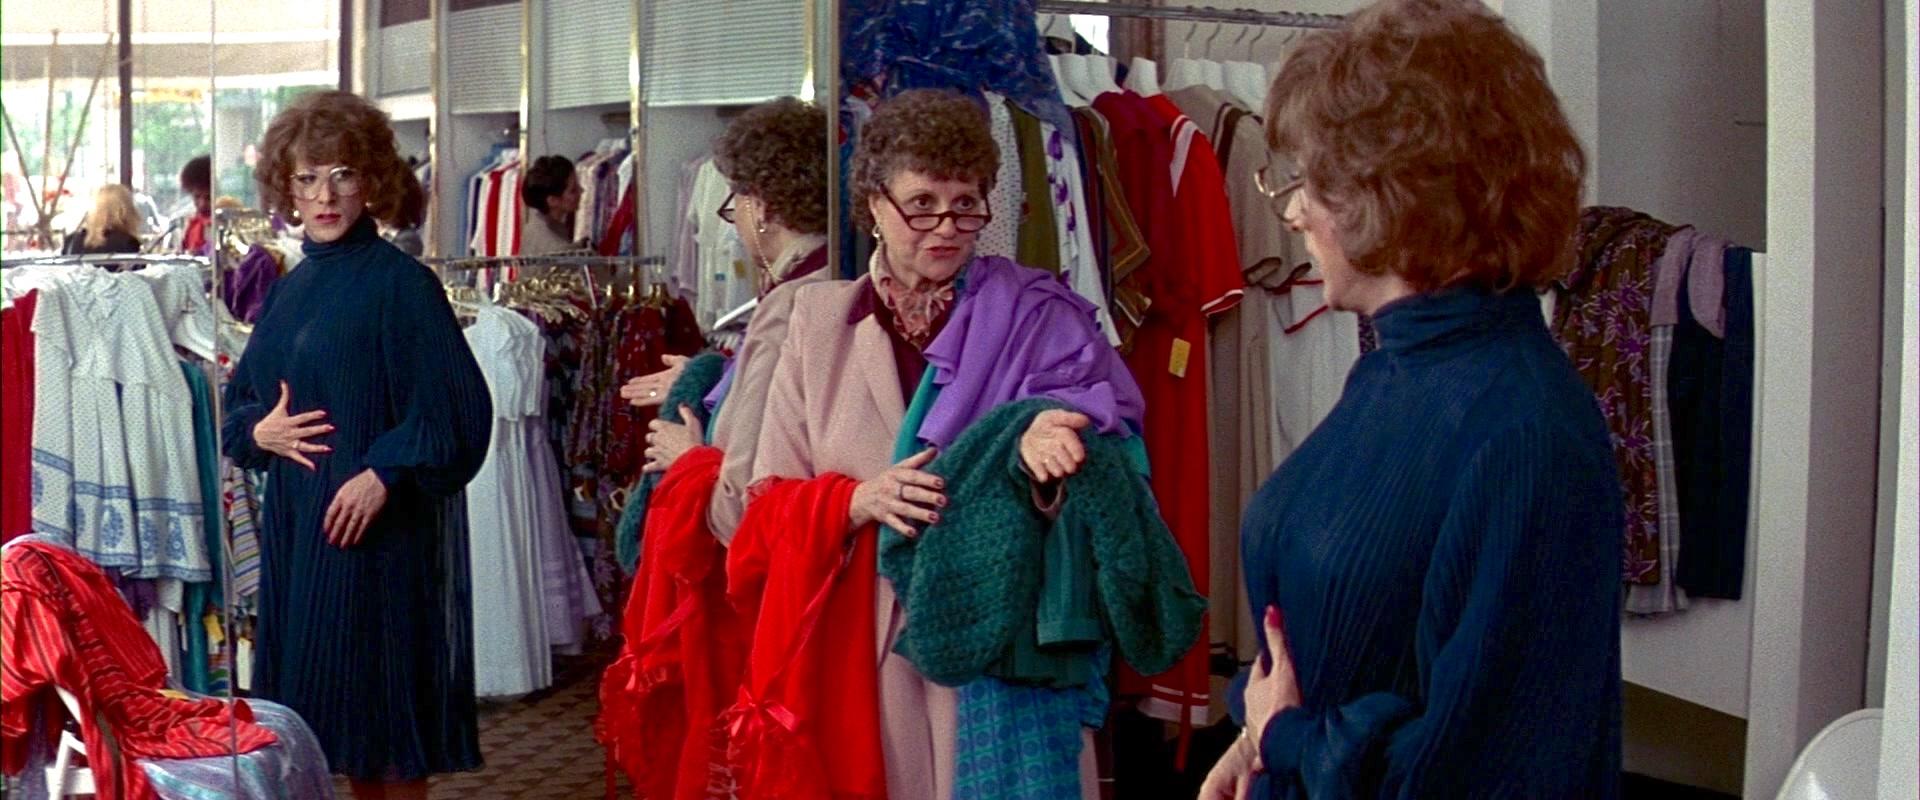 Dustin Hoffman and Marjorie Lovett in Tootsie (1982)